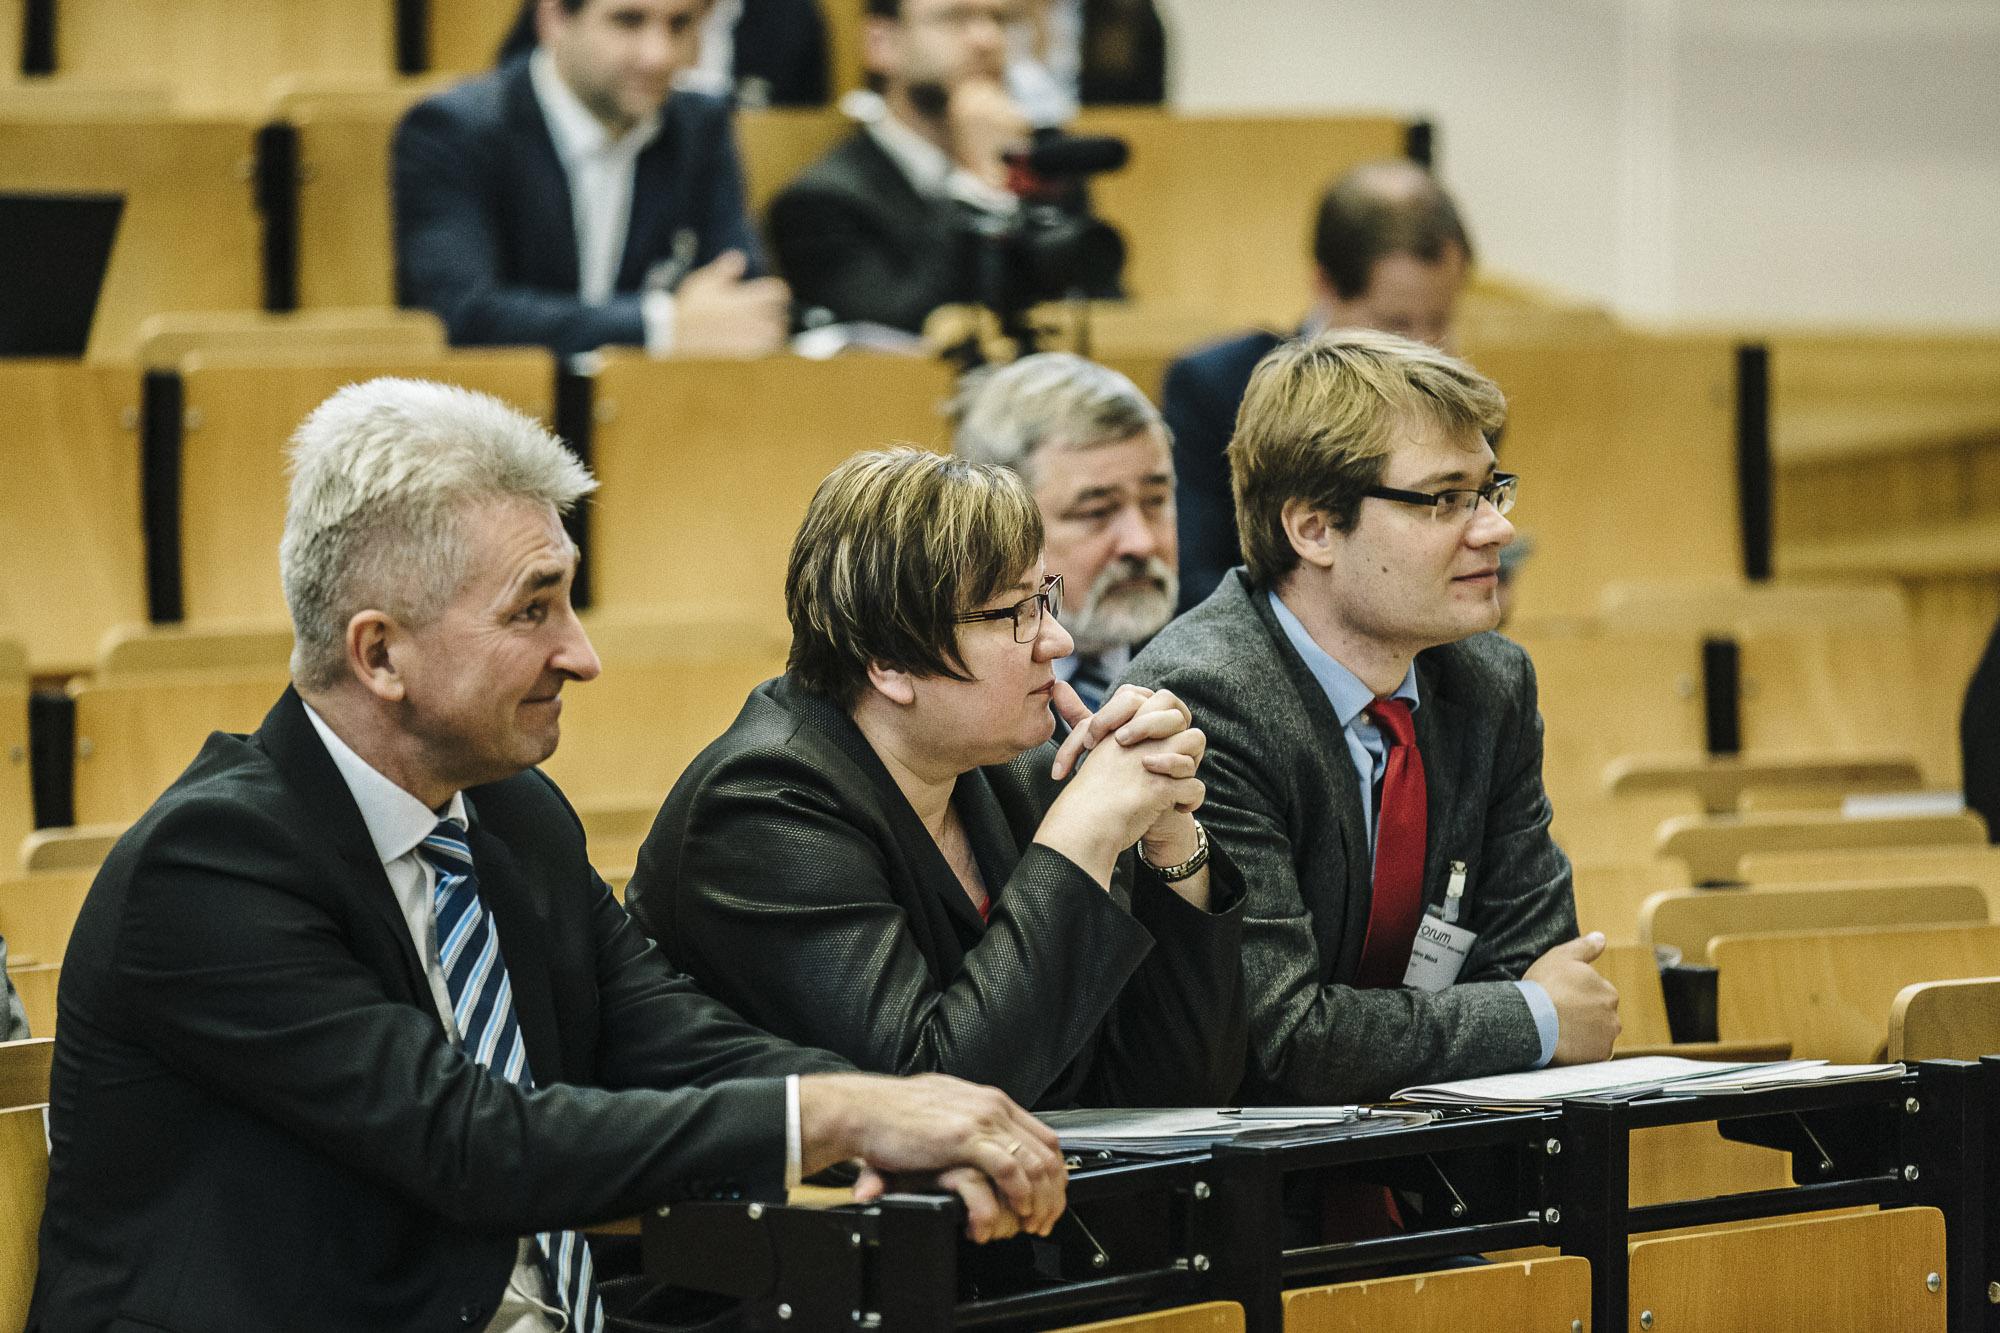 20161006-hhl-g-forum-keynotes-foto-dominik-wolf-0009